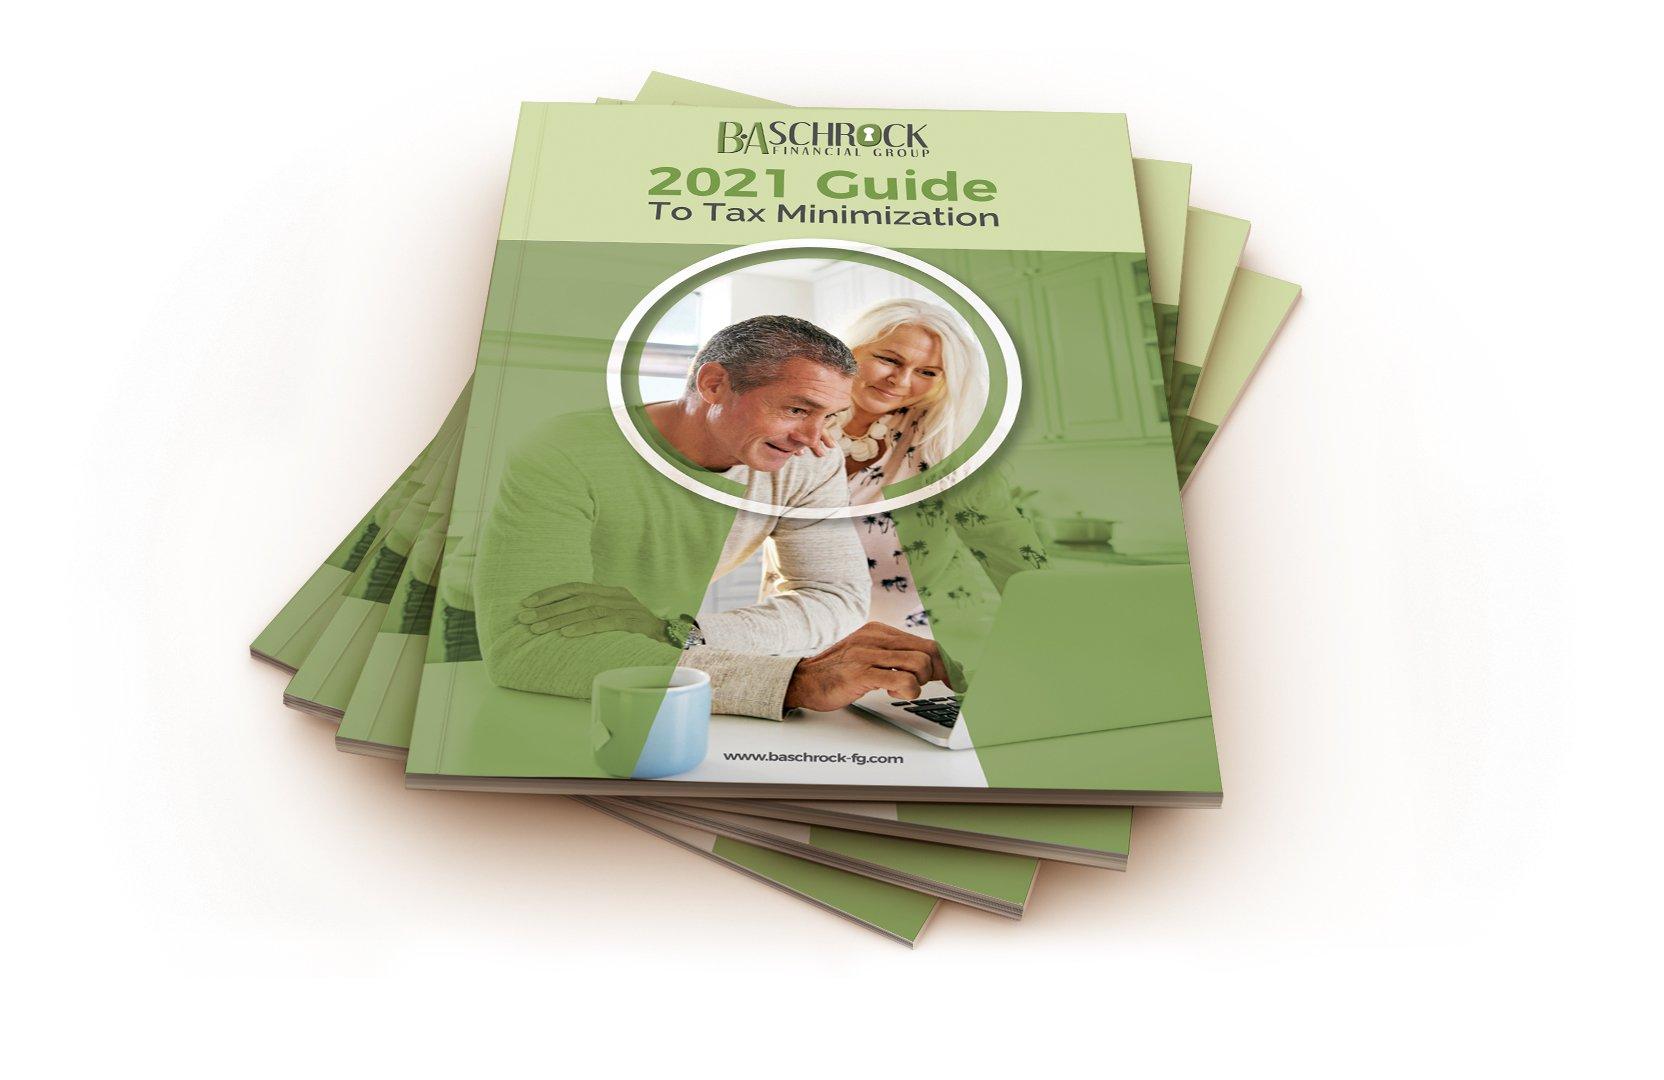 Tax Minimization Guide BA Schrock 2021